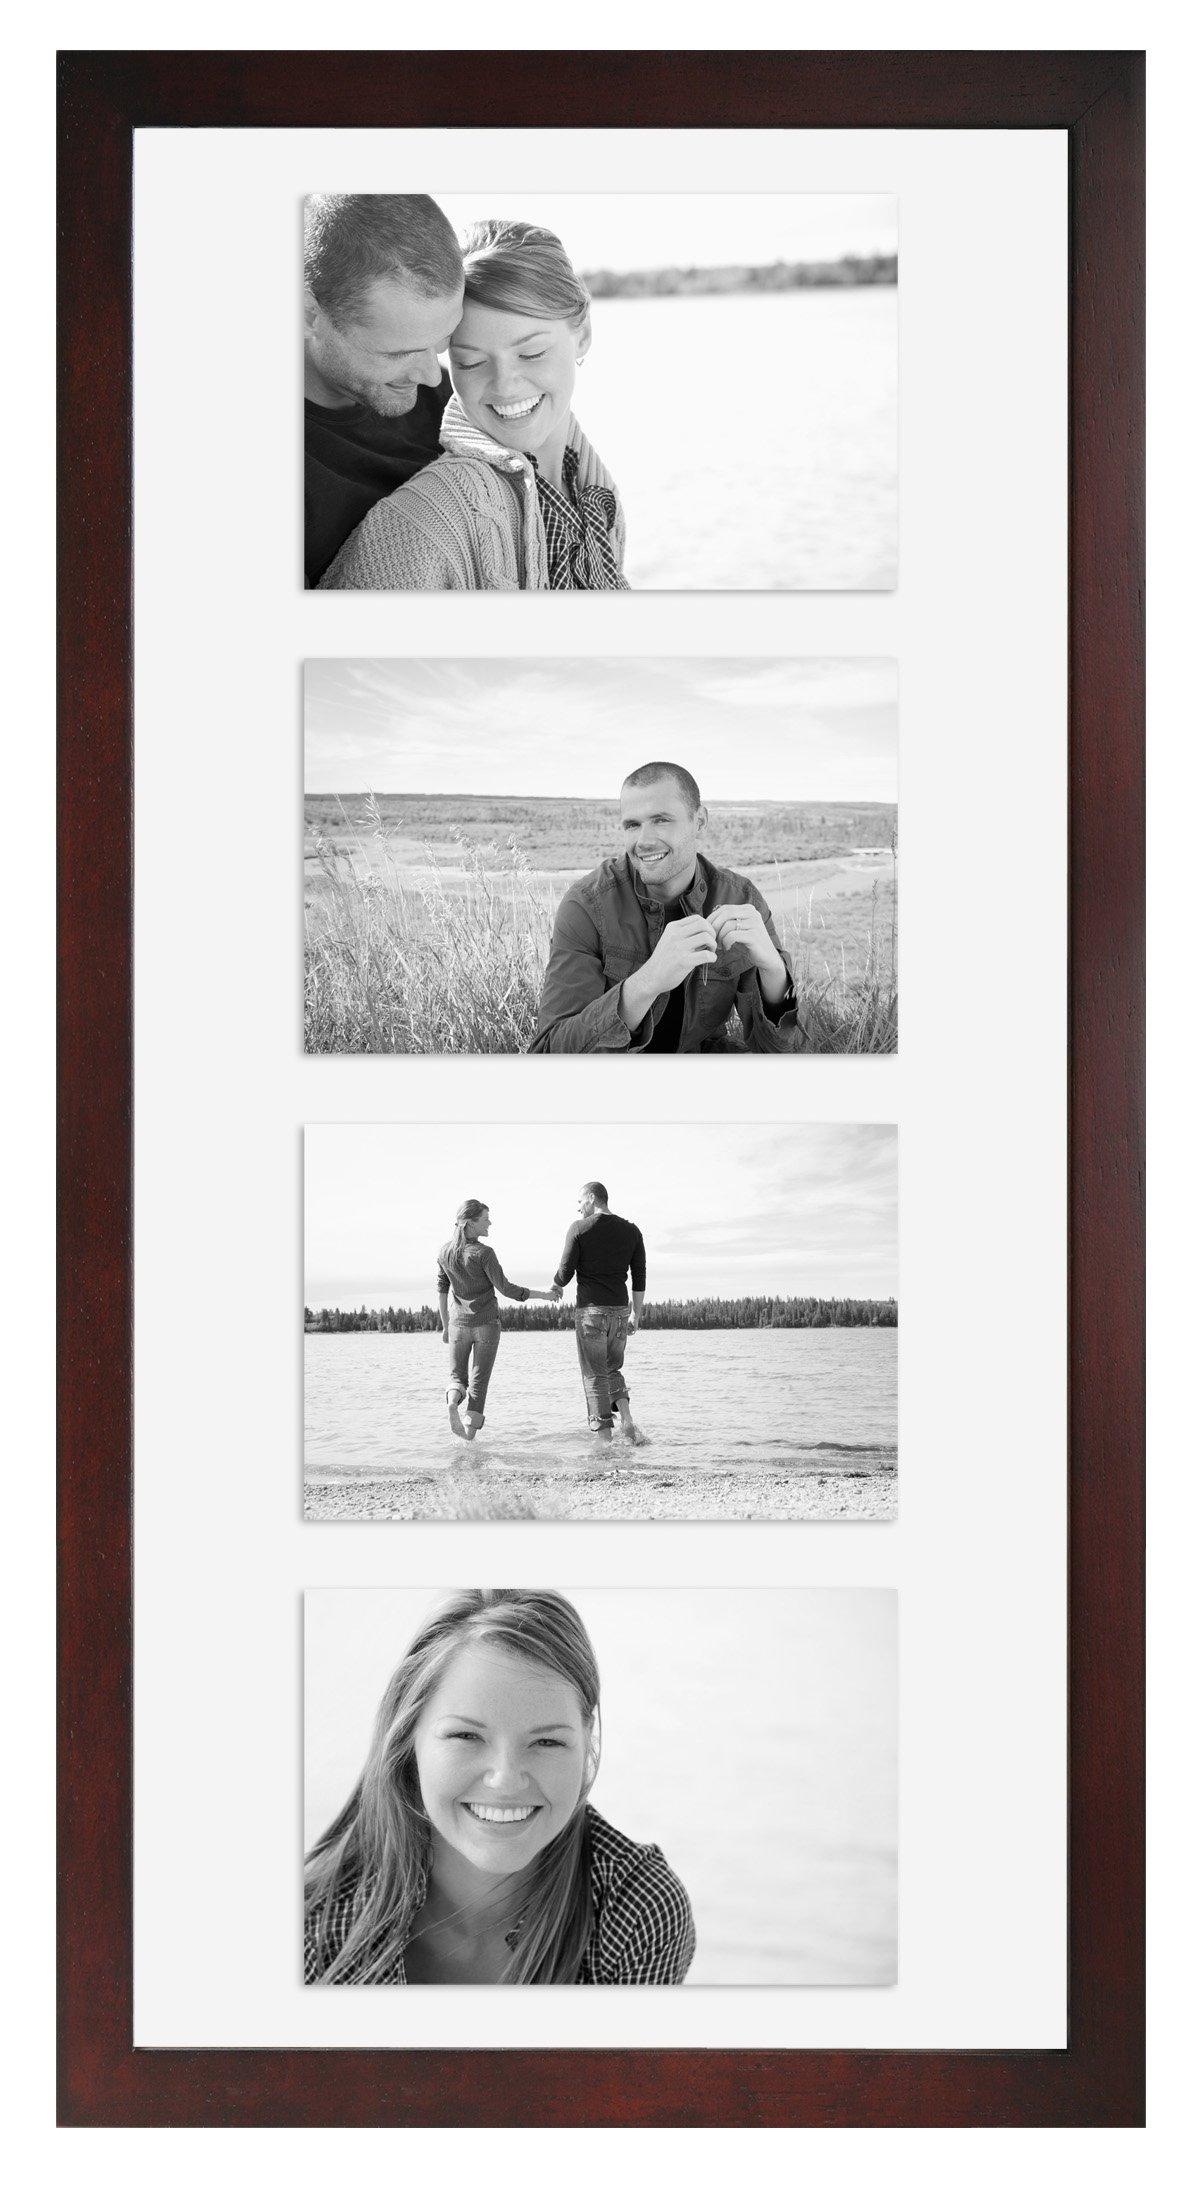 MCS 10x20 Inch Wood Float Frame, Walnut (25663)